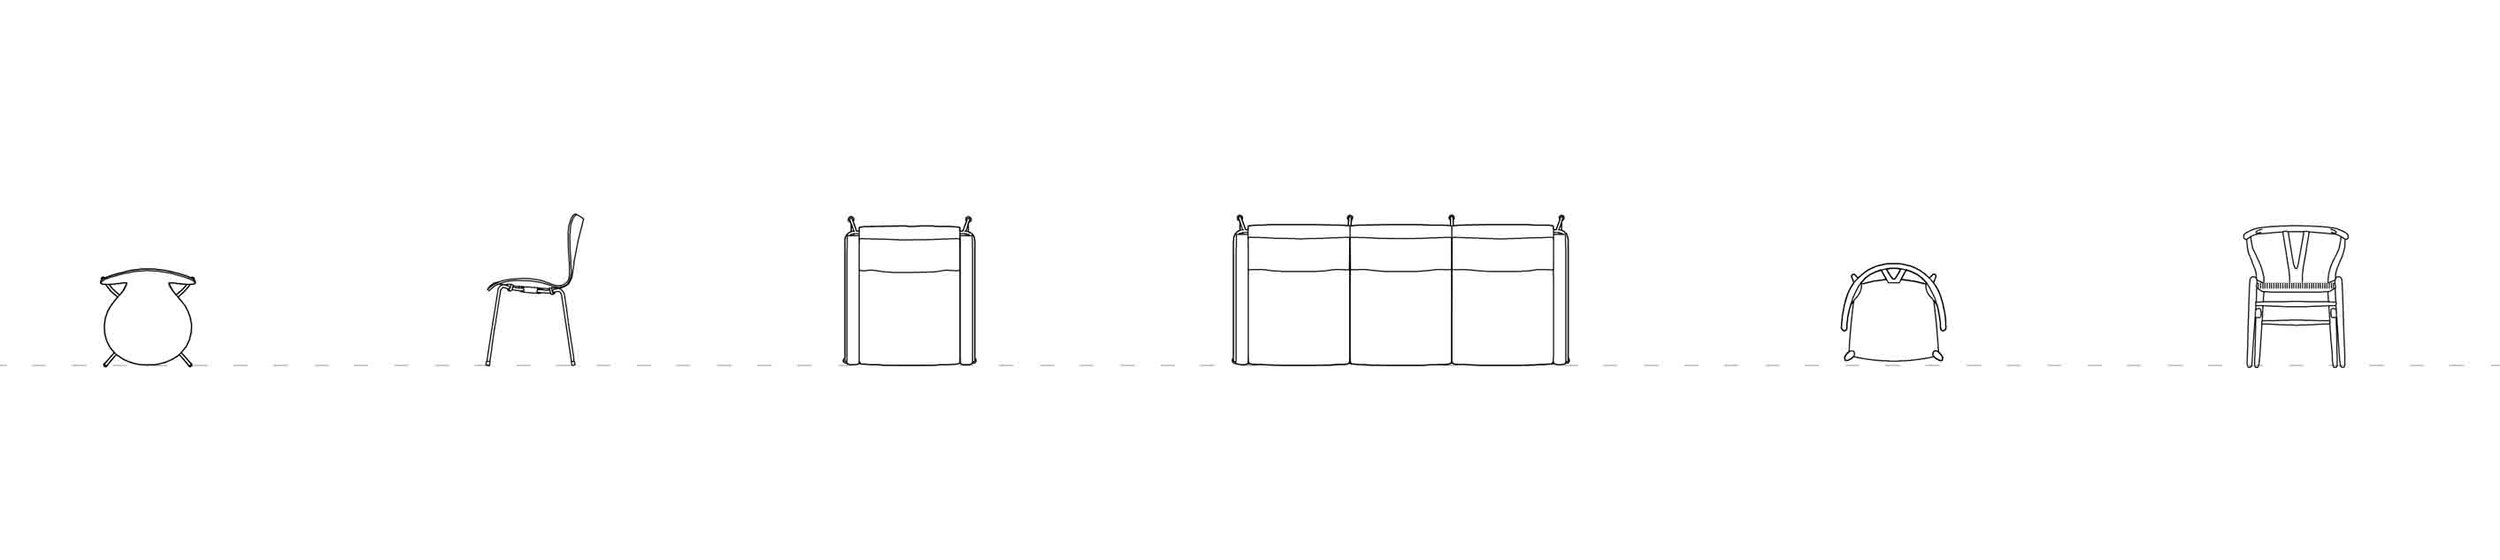 Free_CAD_Furniture_Blocks.jpg